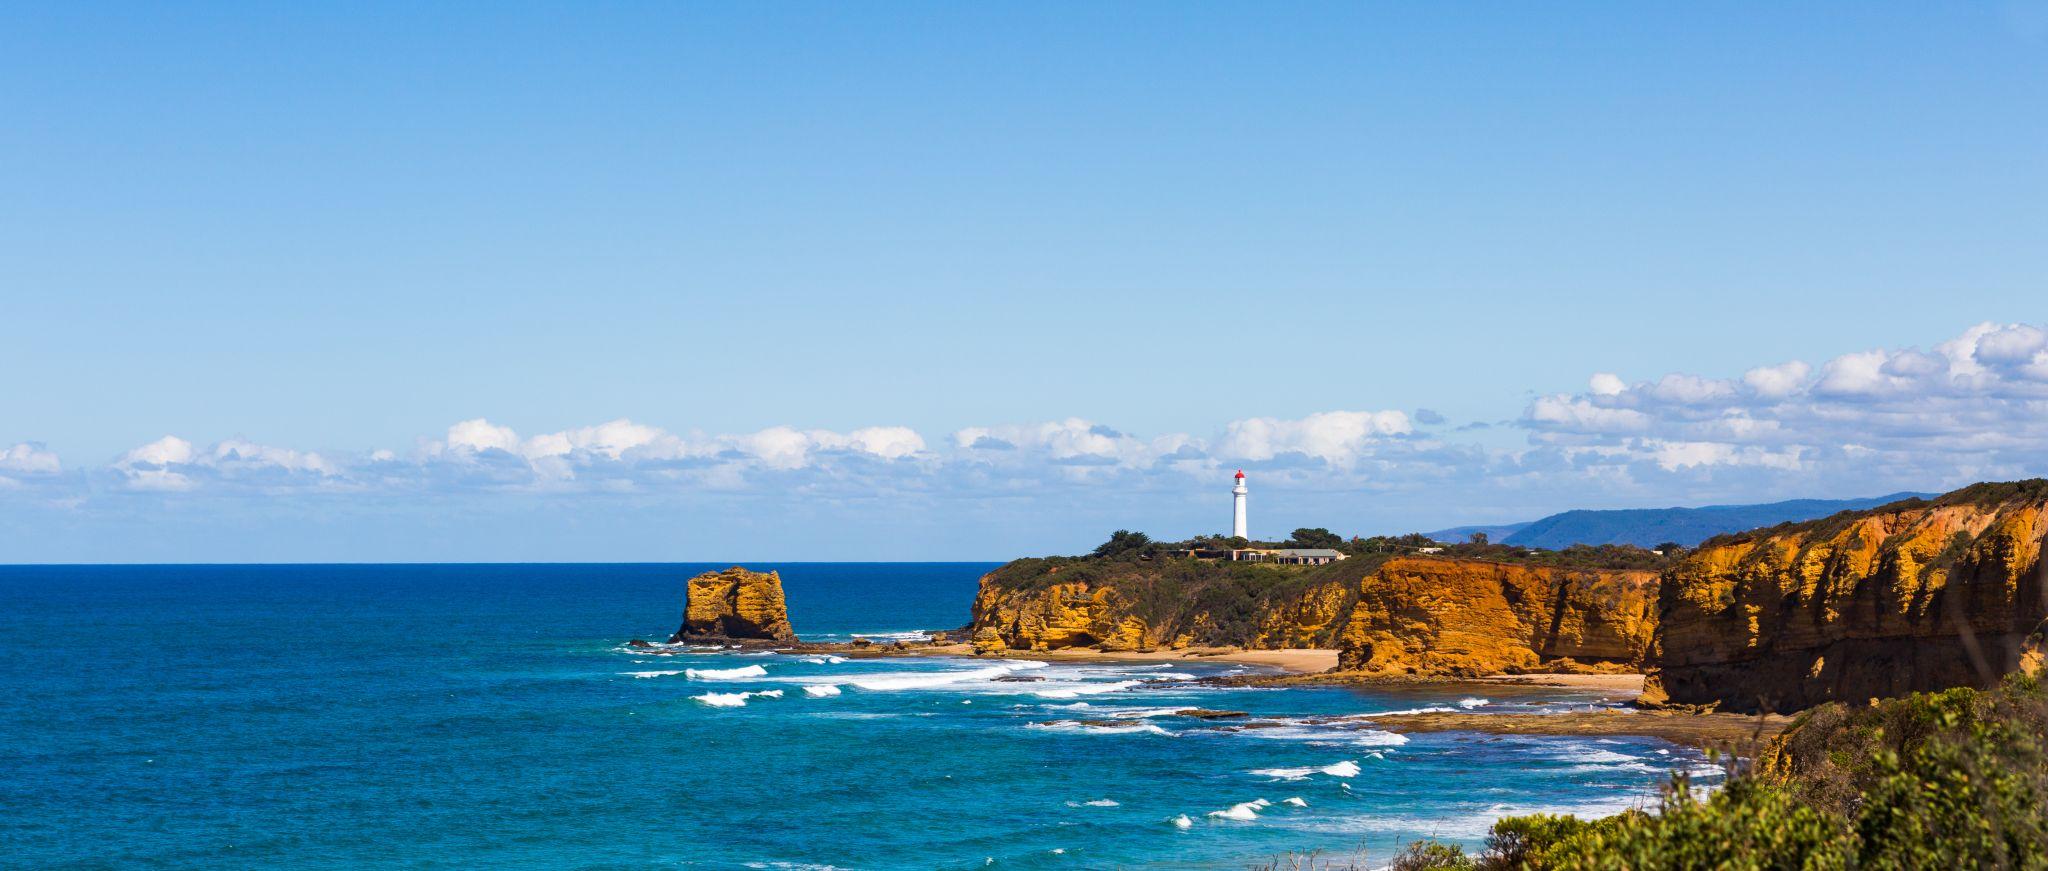 Split Point Lighthouse from Split Point Lookout, Australia